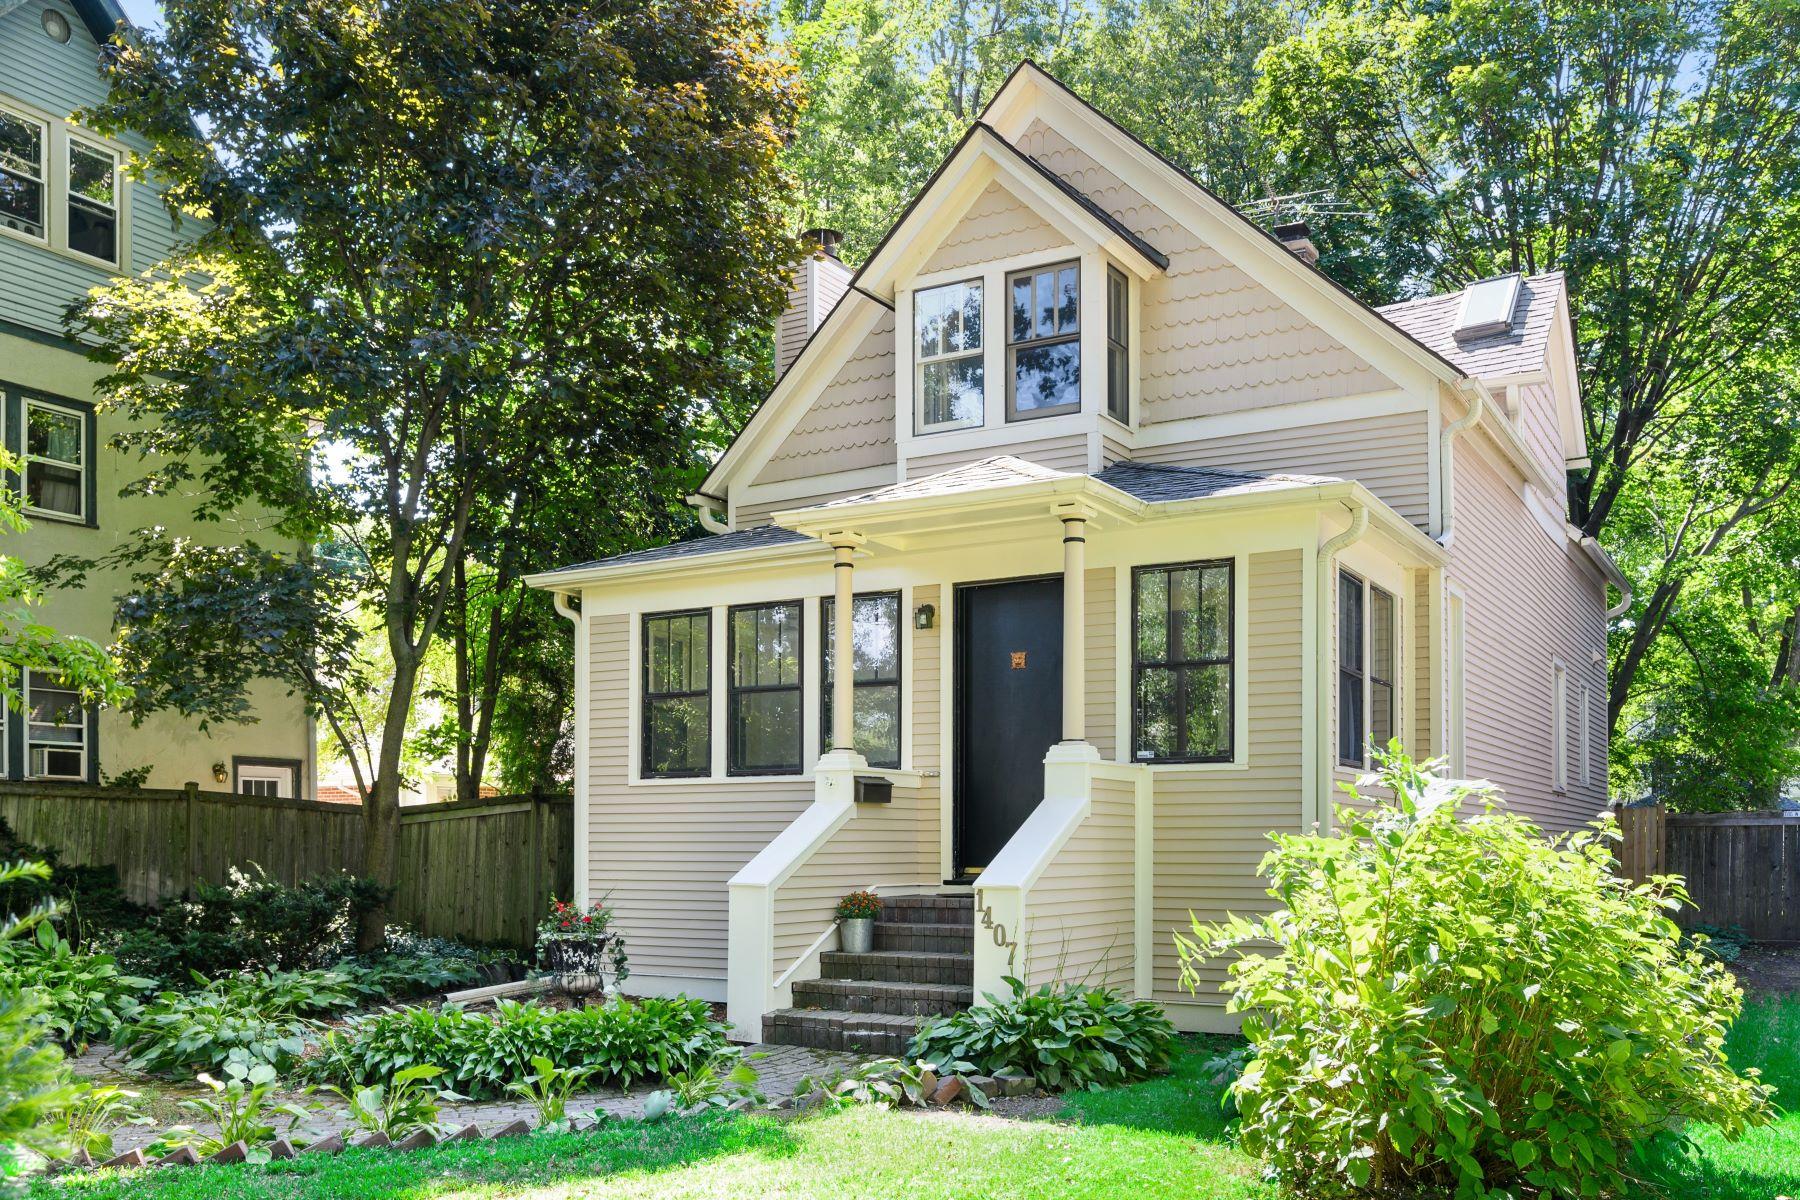 Single Family Homes for Active at Beautiful Farmhouse 1407 Elmwood Avenue Wilmette, Illinois 60091 United States